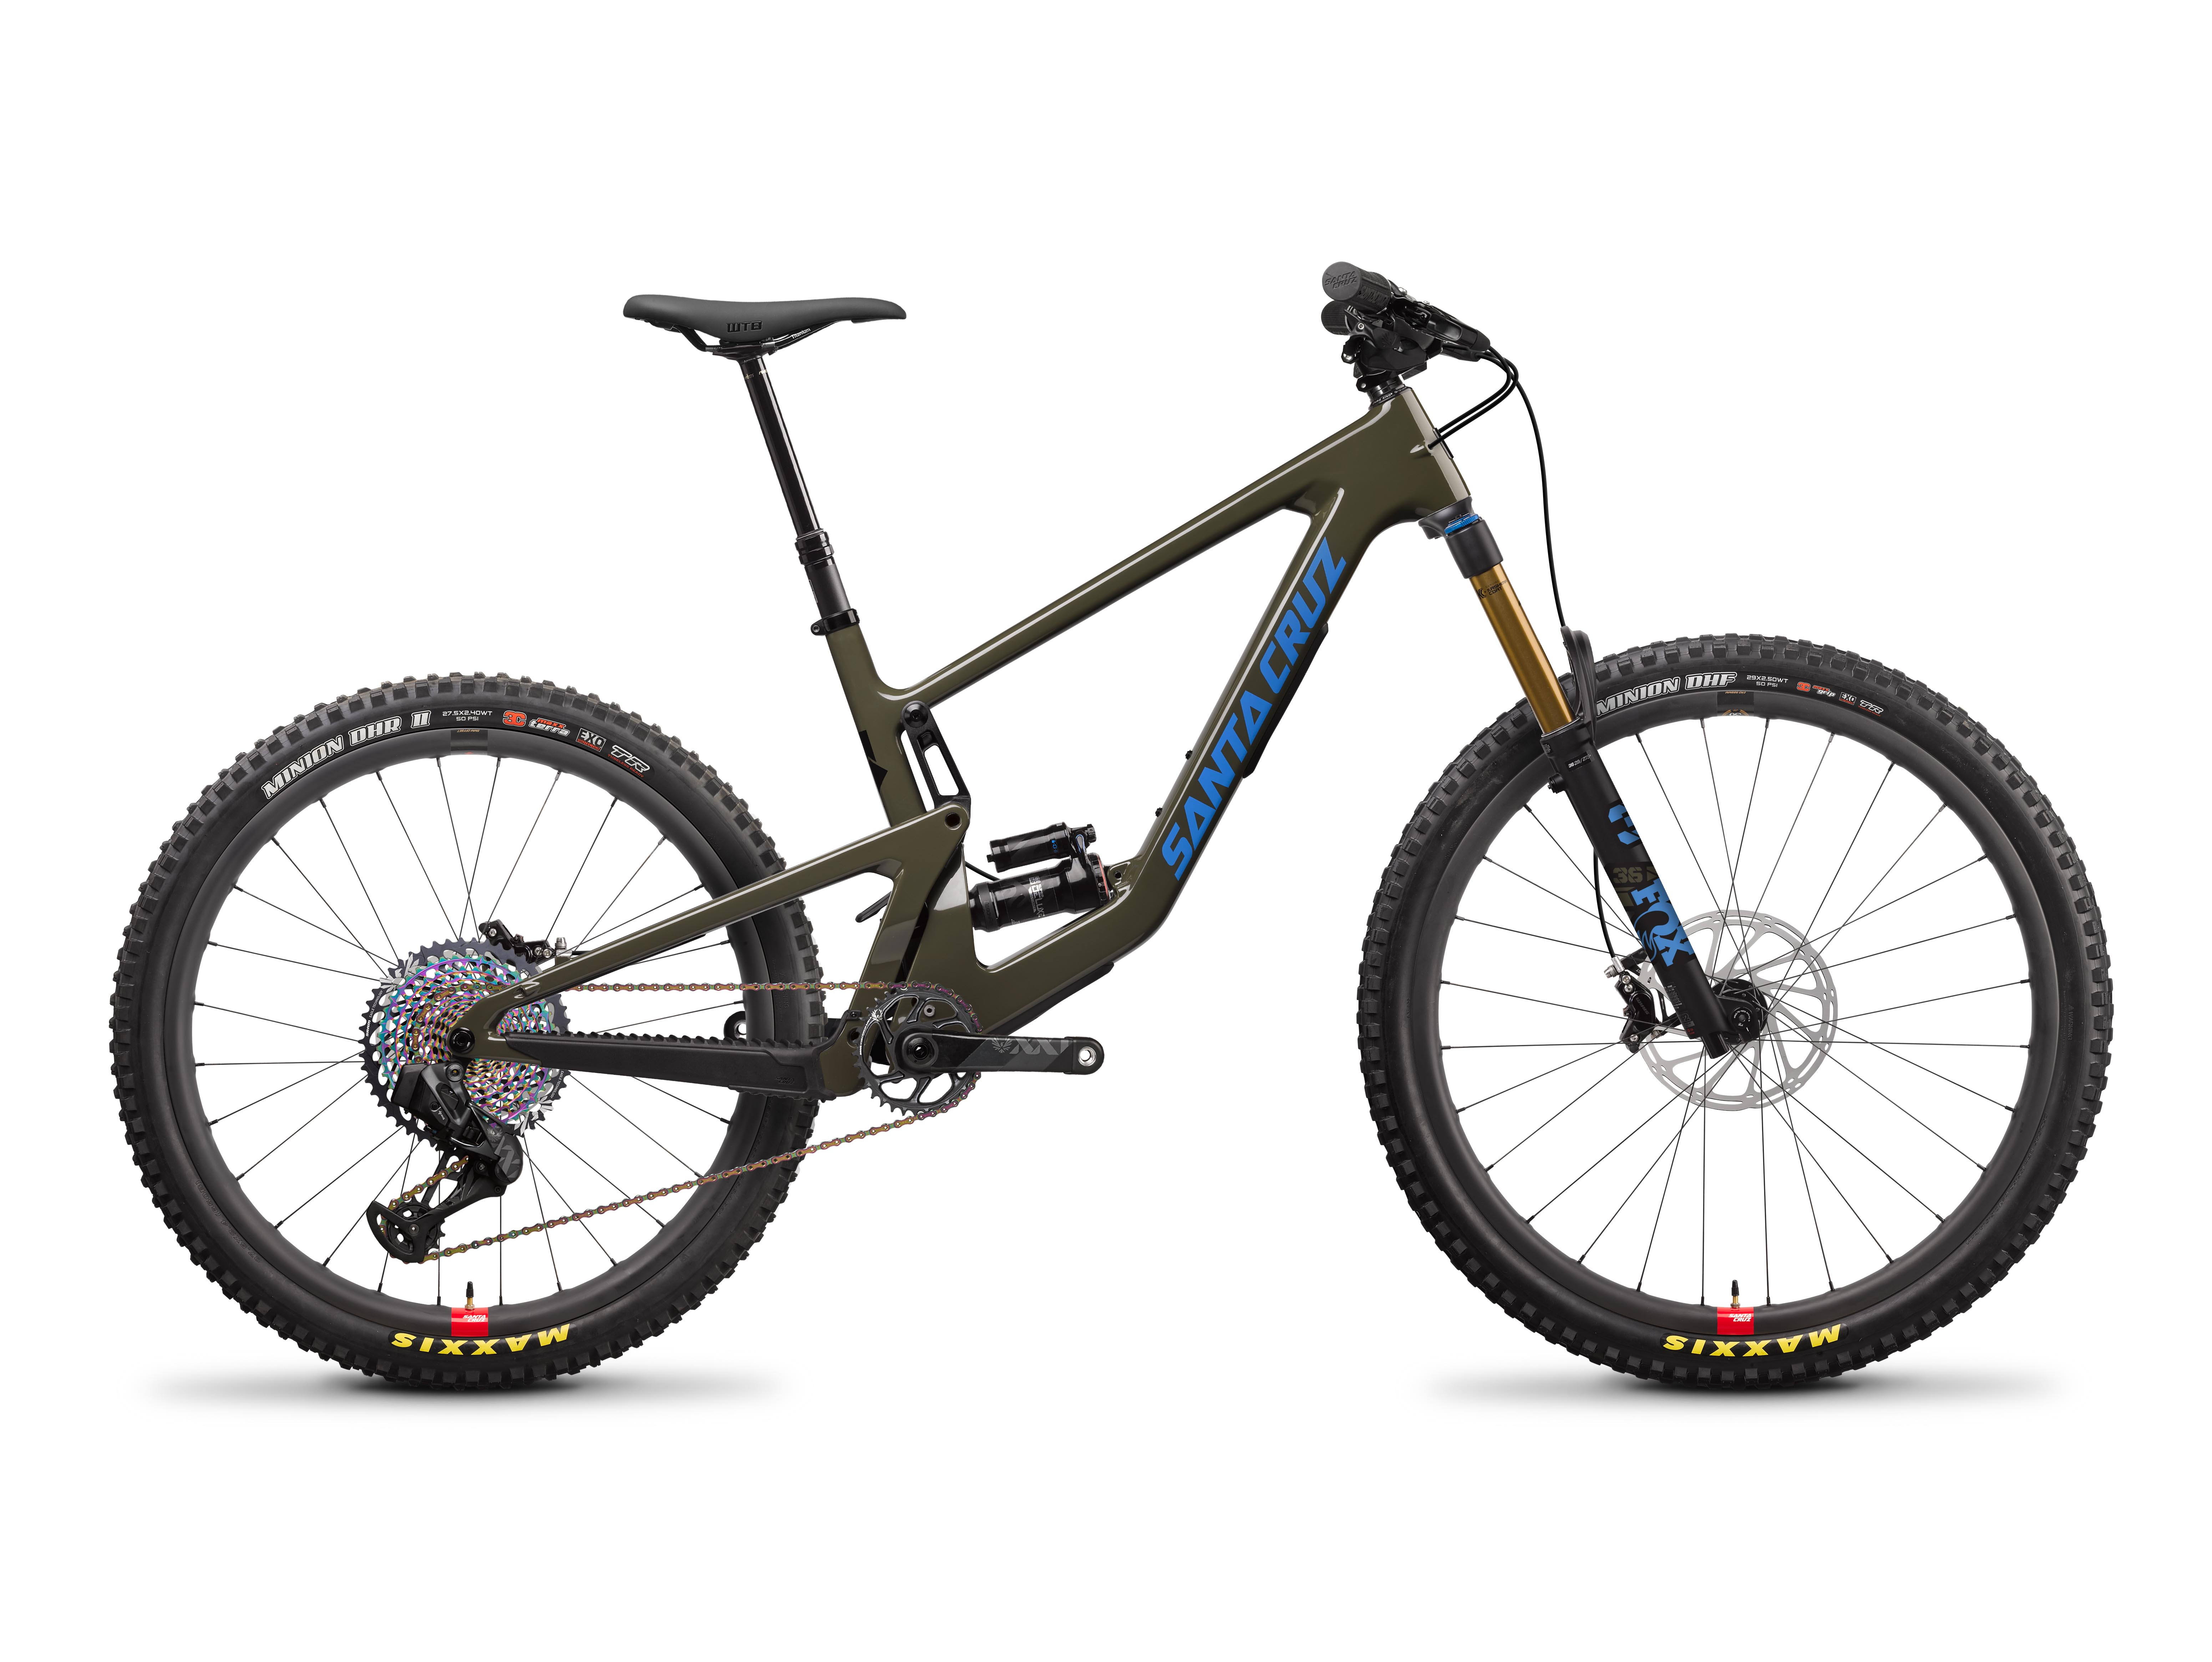 Image of Santa Cruz Bronson CC XX1 AXS Reserve MX Mountain Bike 2022 Moss